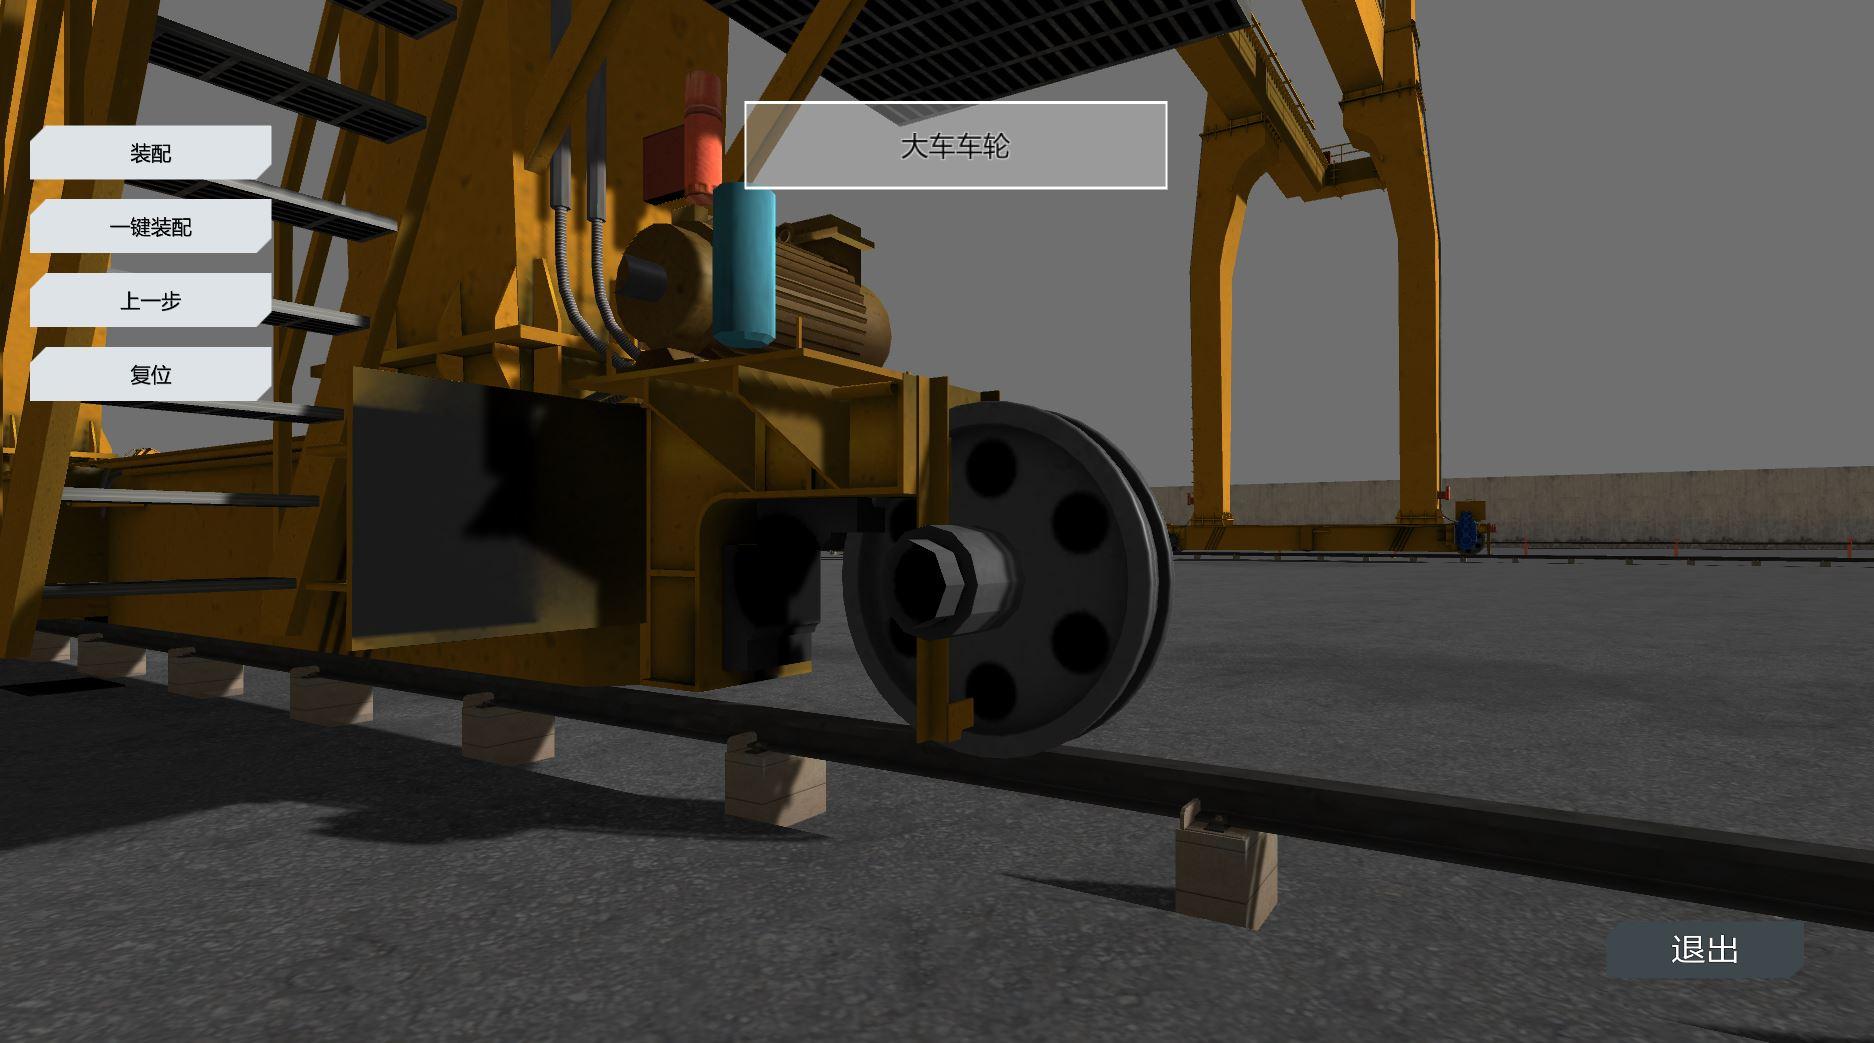 Simulation training of crane detection(起重机模拟检测训练)